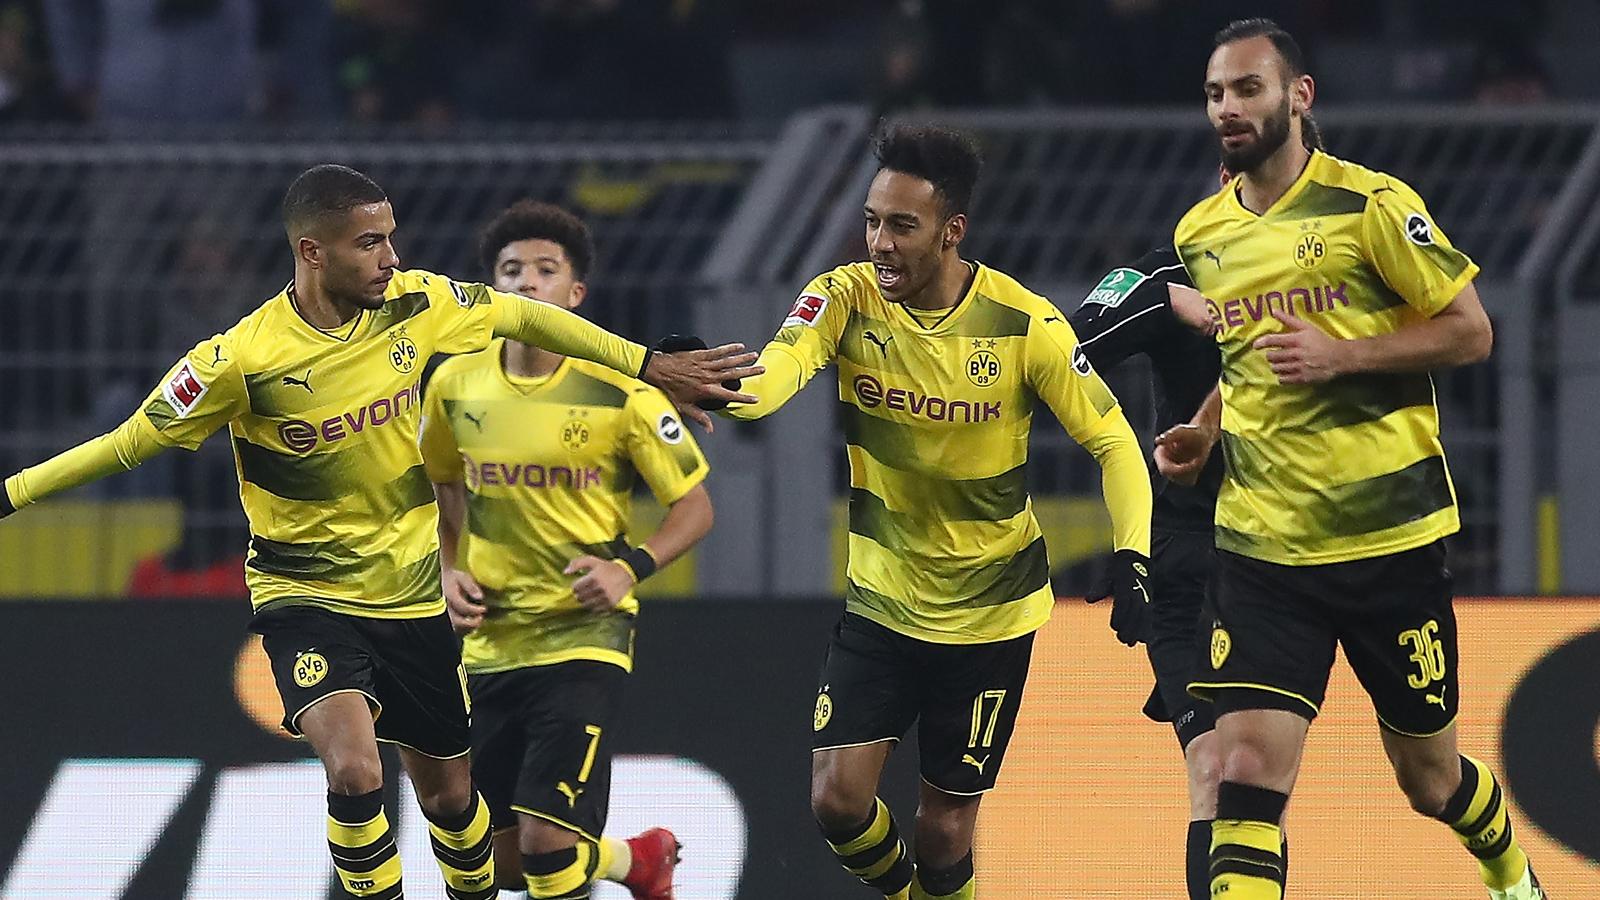 Dortmund rettet dank Last-Minute-Tor einen Punkt (ARD, Autor: Stephan Kaussen)